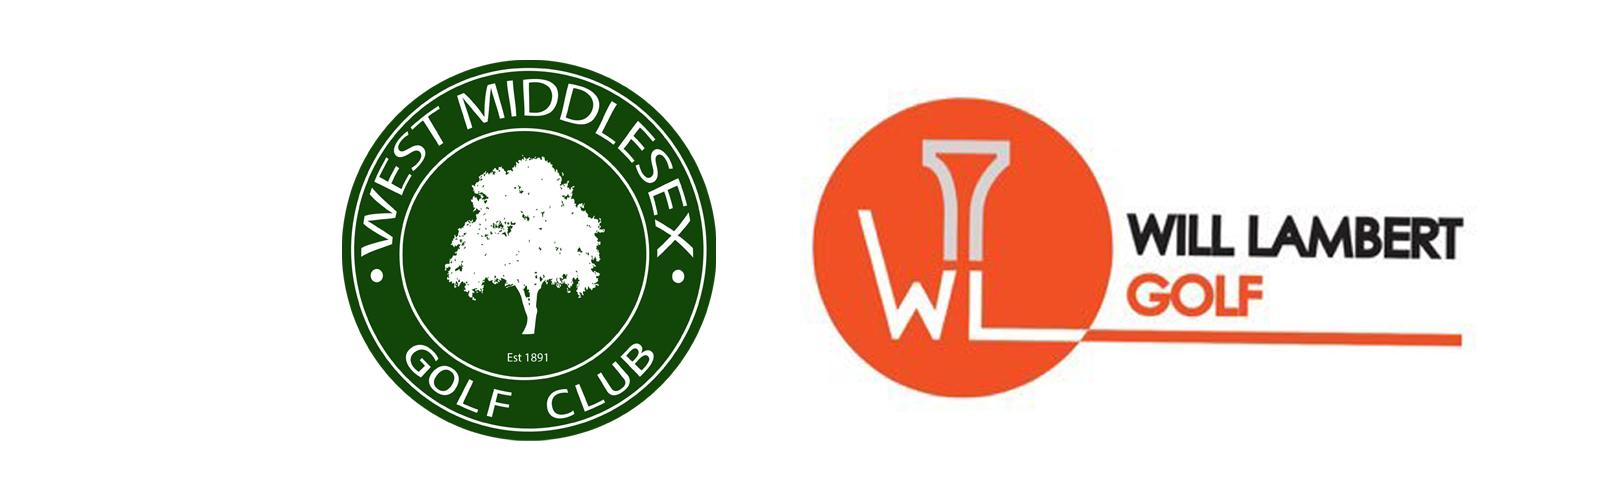 Pro Shop | West Middlesex Golf Club